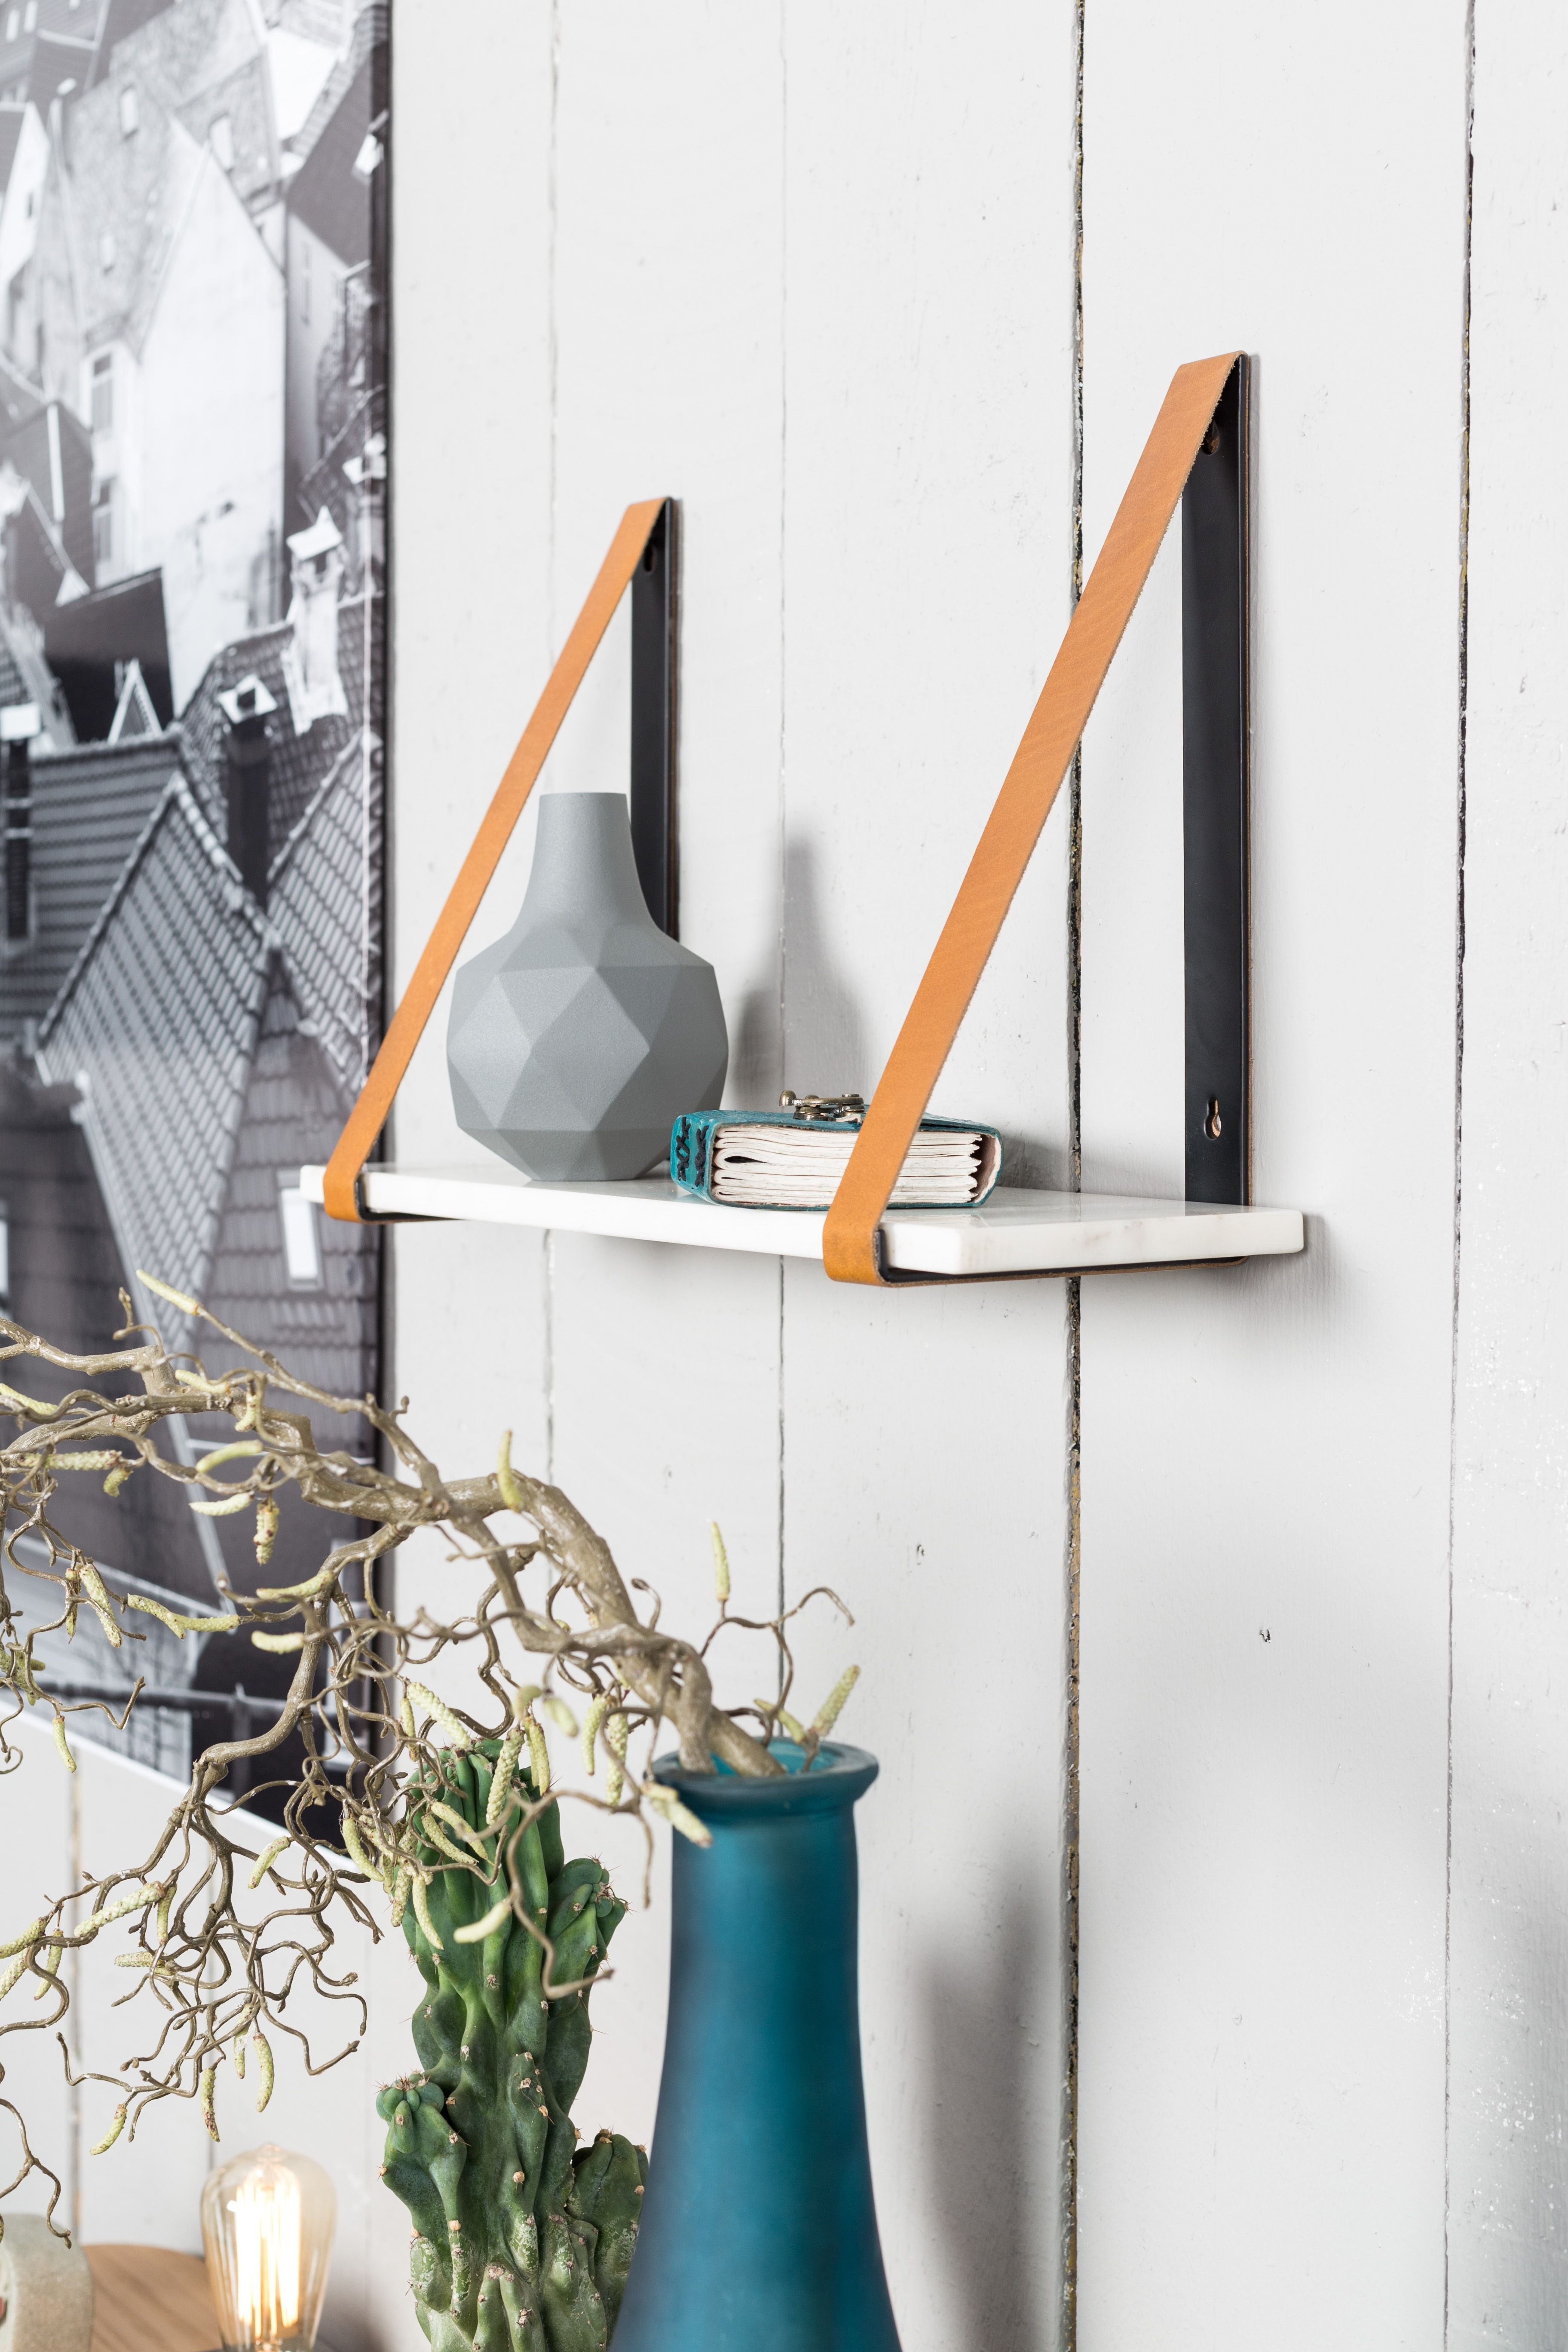 Fad wall shelf - City Chic | Pinterest - Huiskamer en Interieur